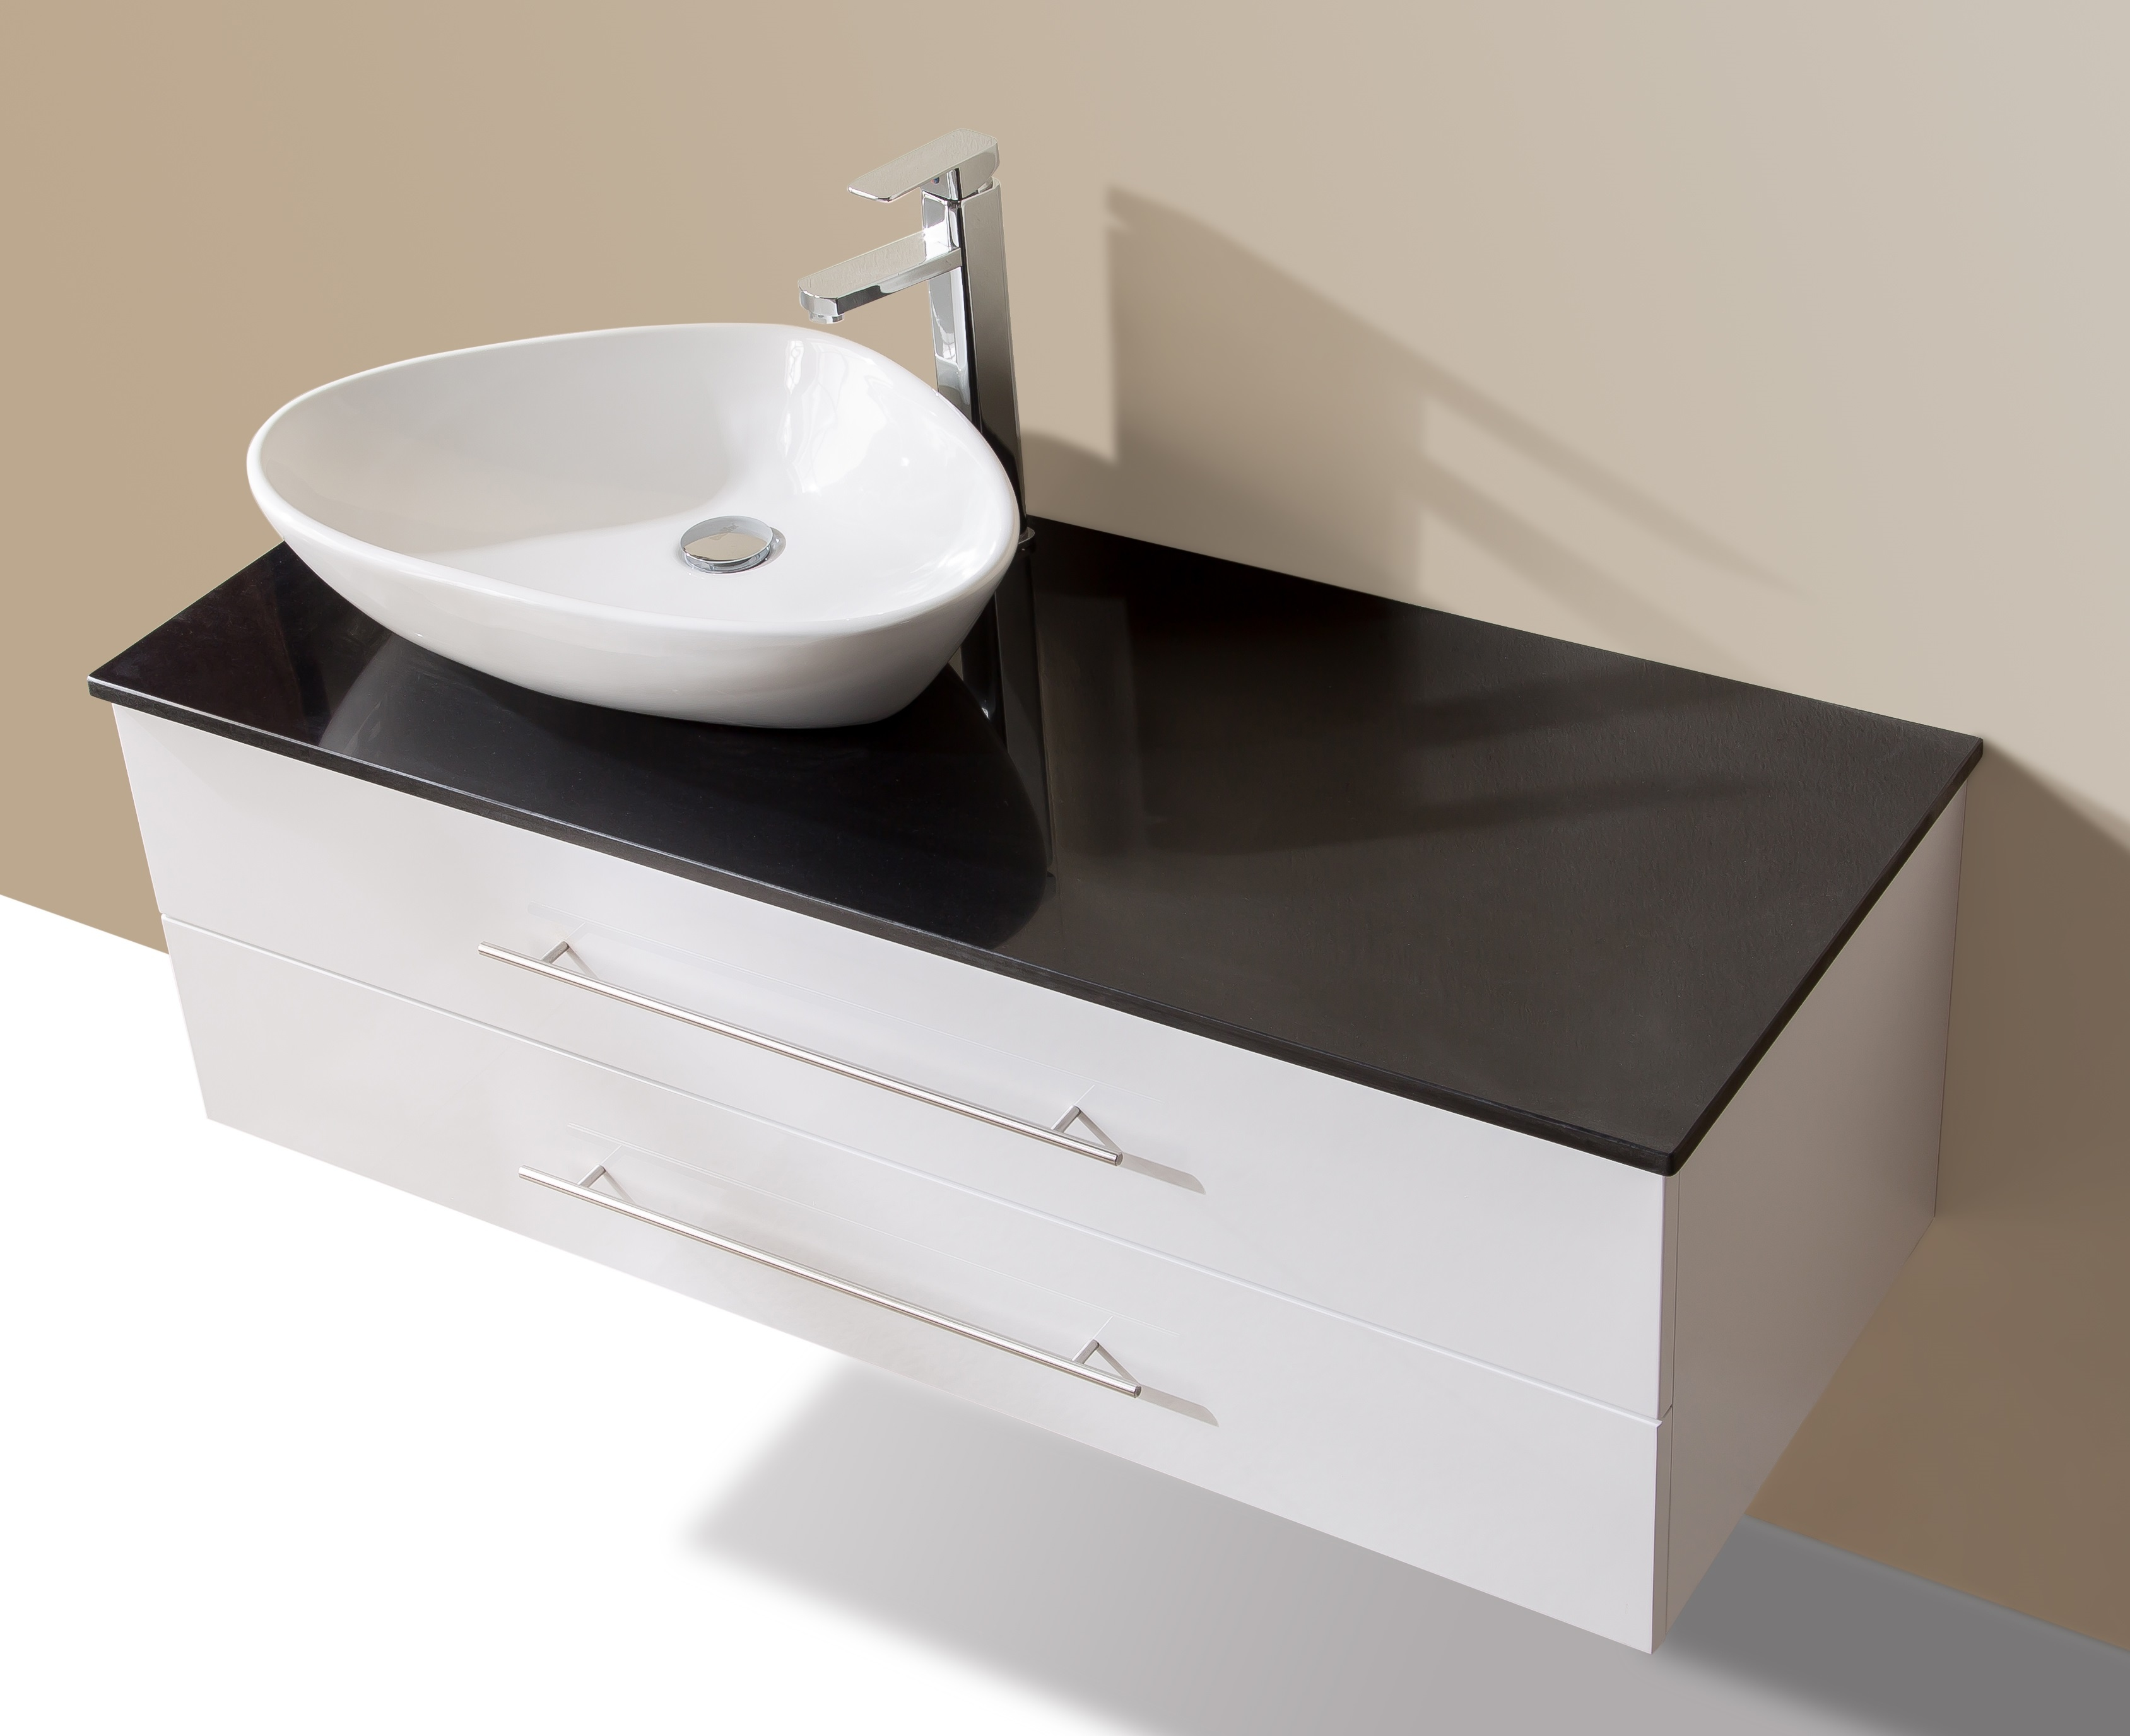 1200mm Wall Hung Bathroom Vanity Unit With Stone Top, Basin - Della Francesca  Z2601